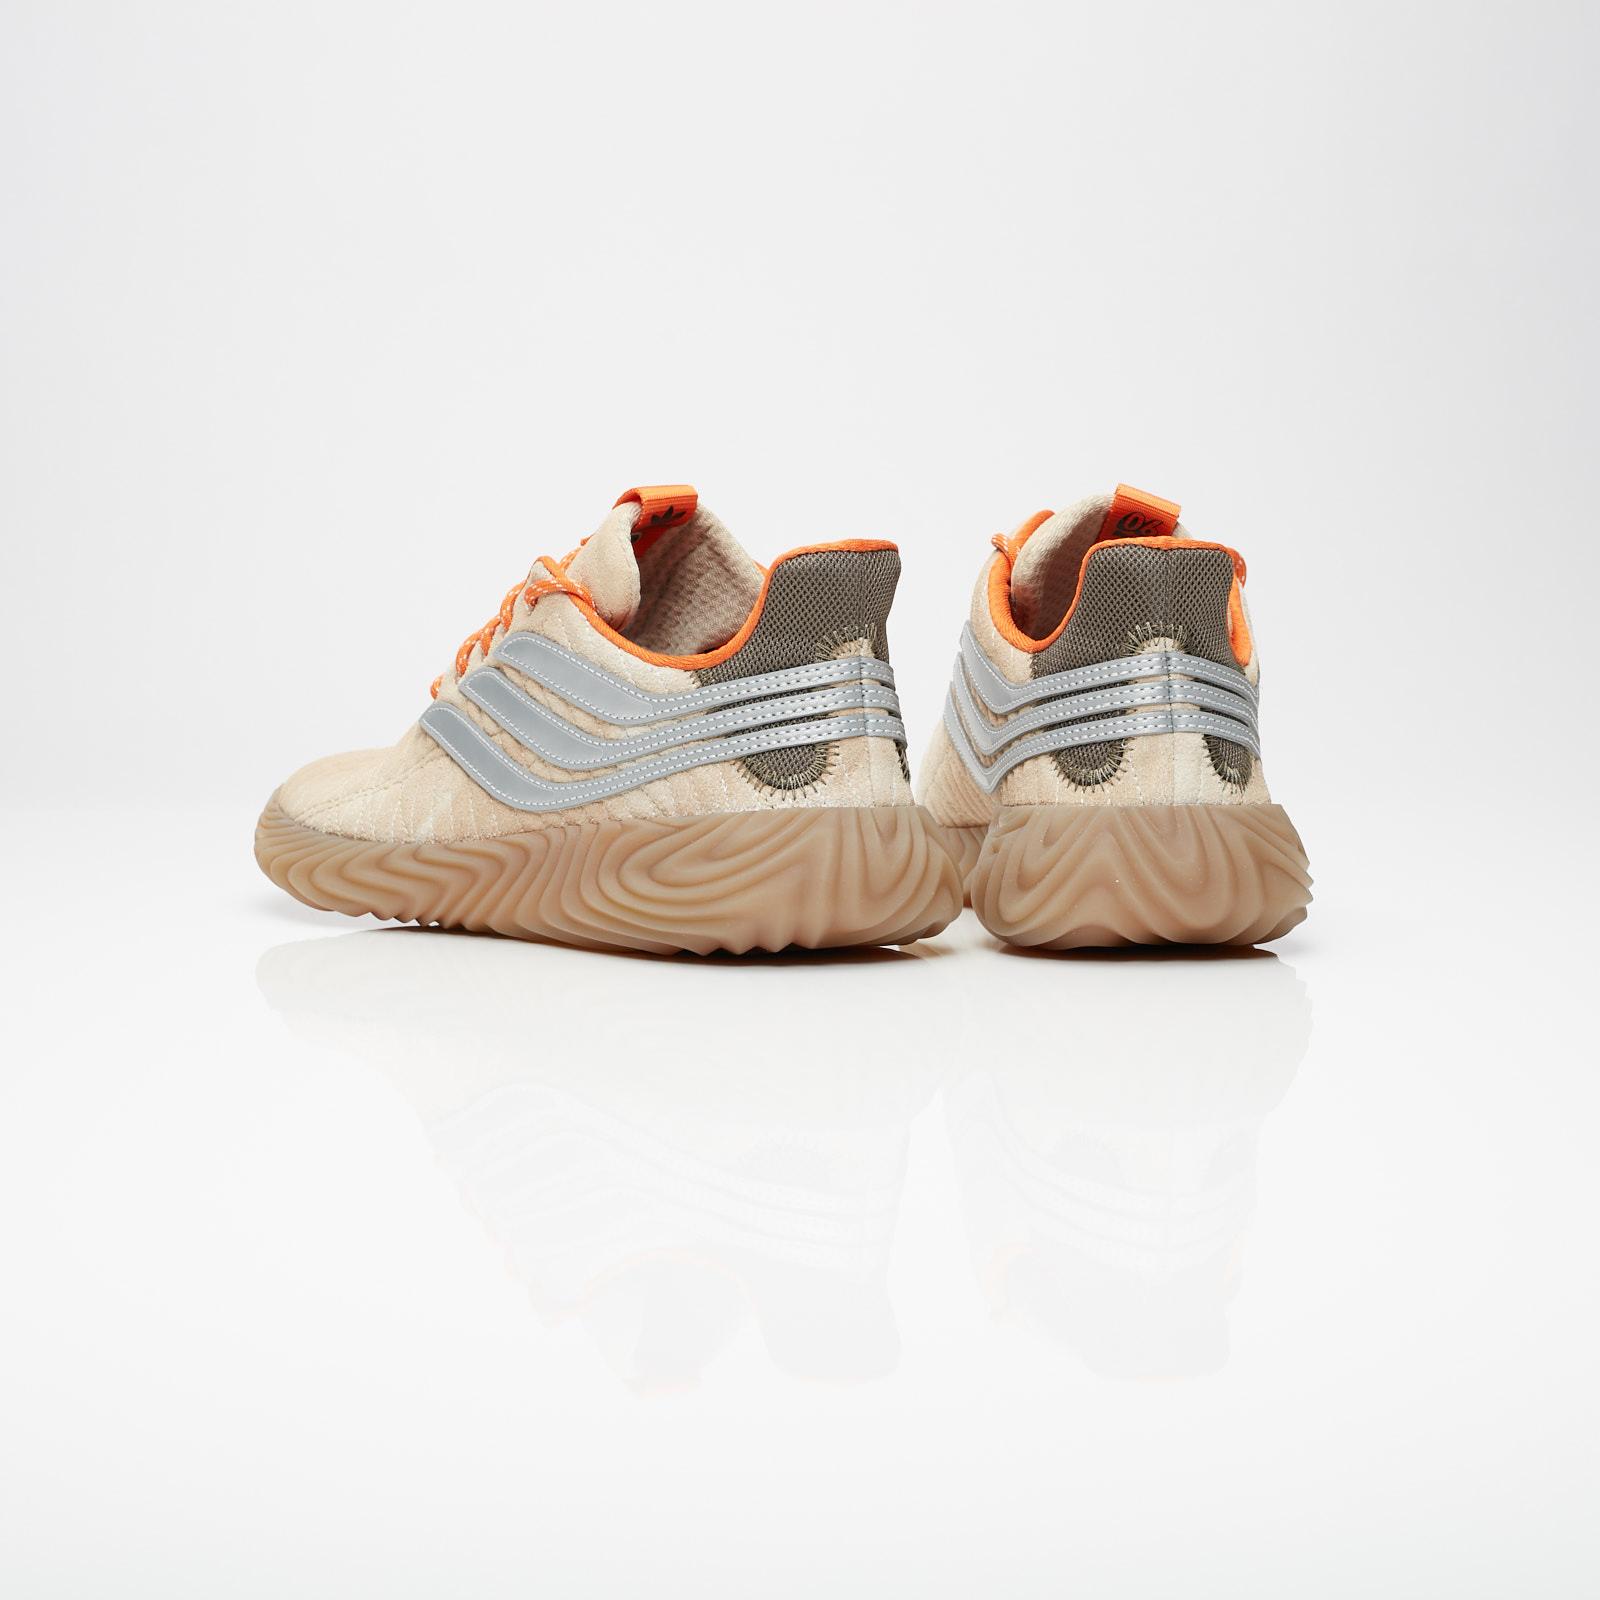 the latest 55190 53ad1 adidas Sobakov x Bodega - Bc0818 - Sneakersnstuff | sneakers ...